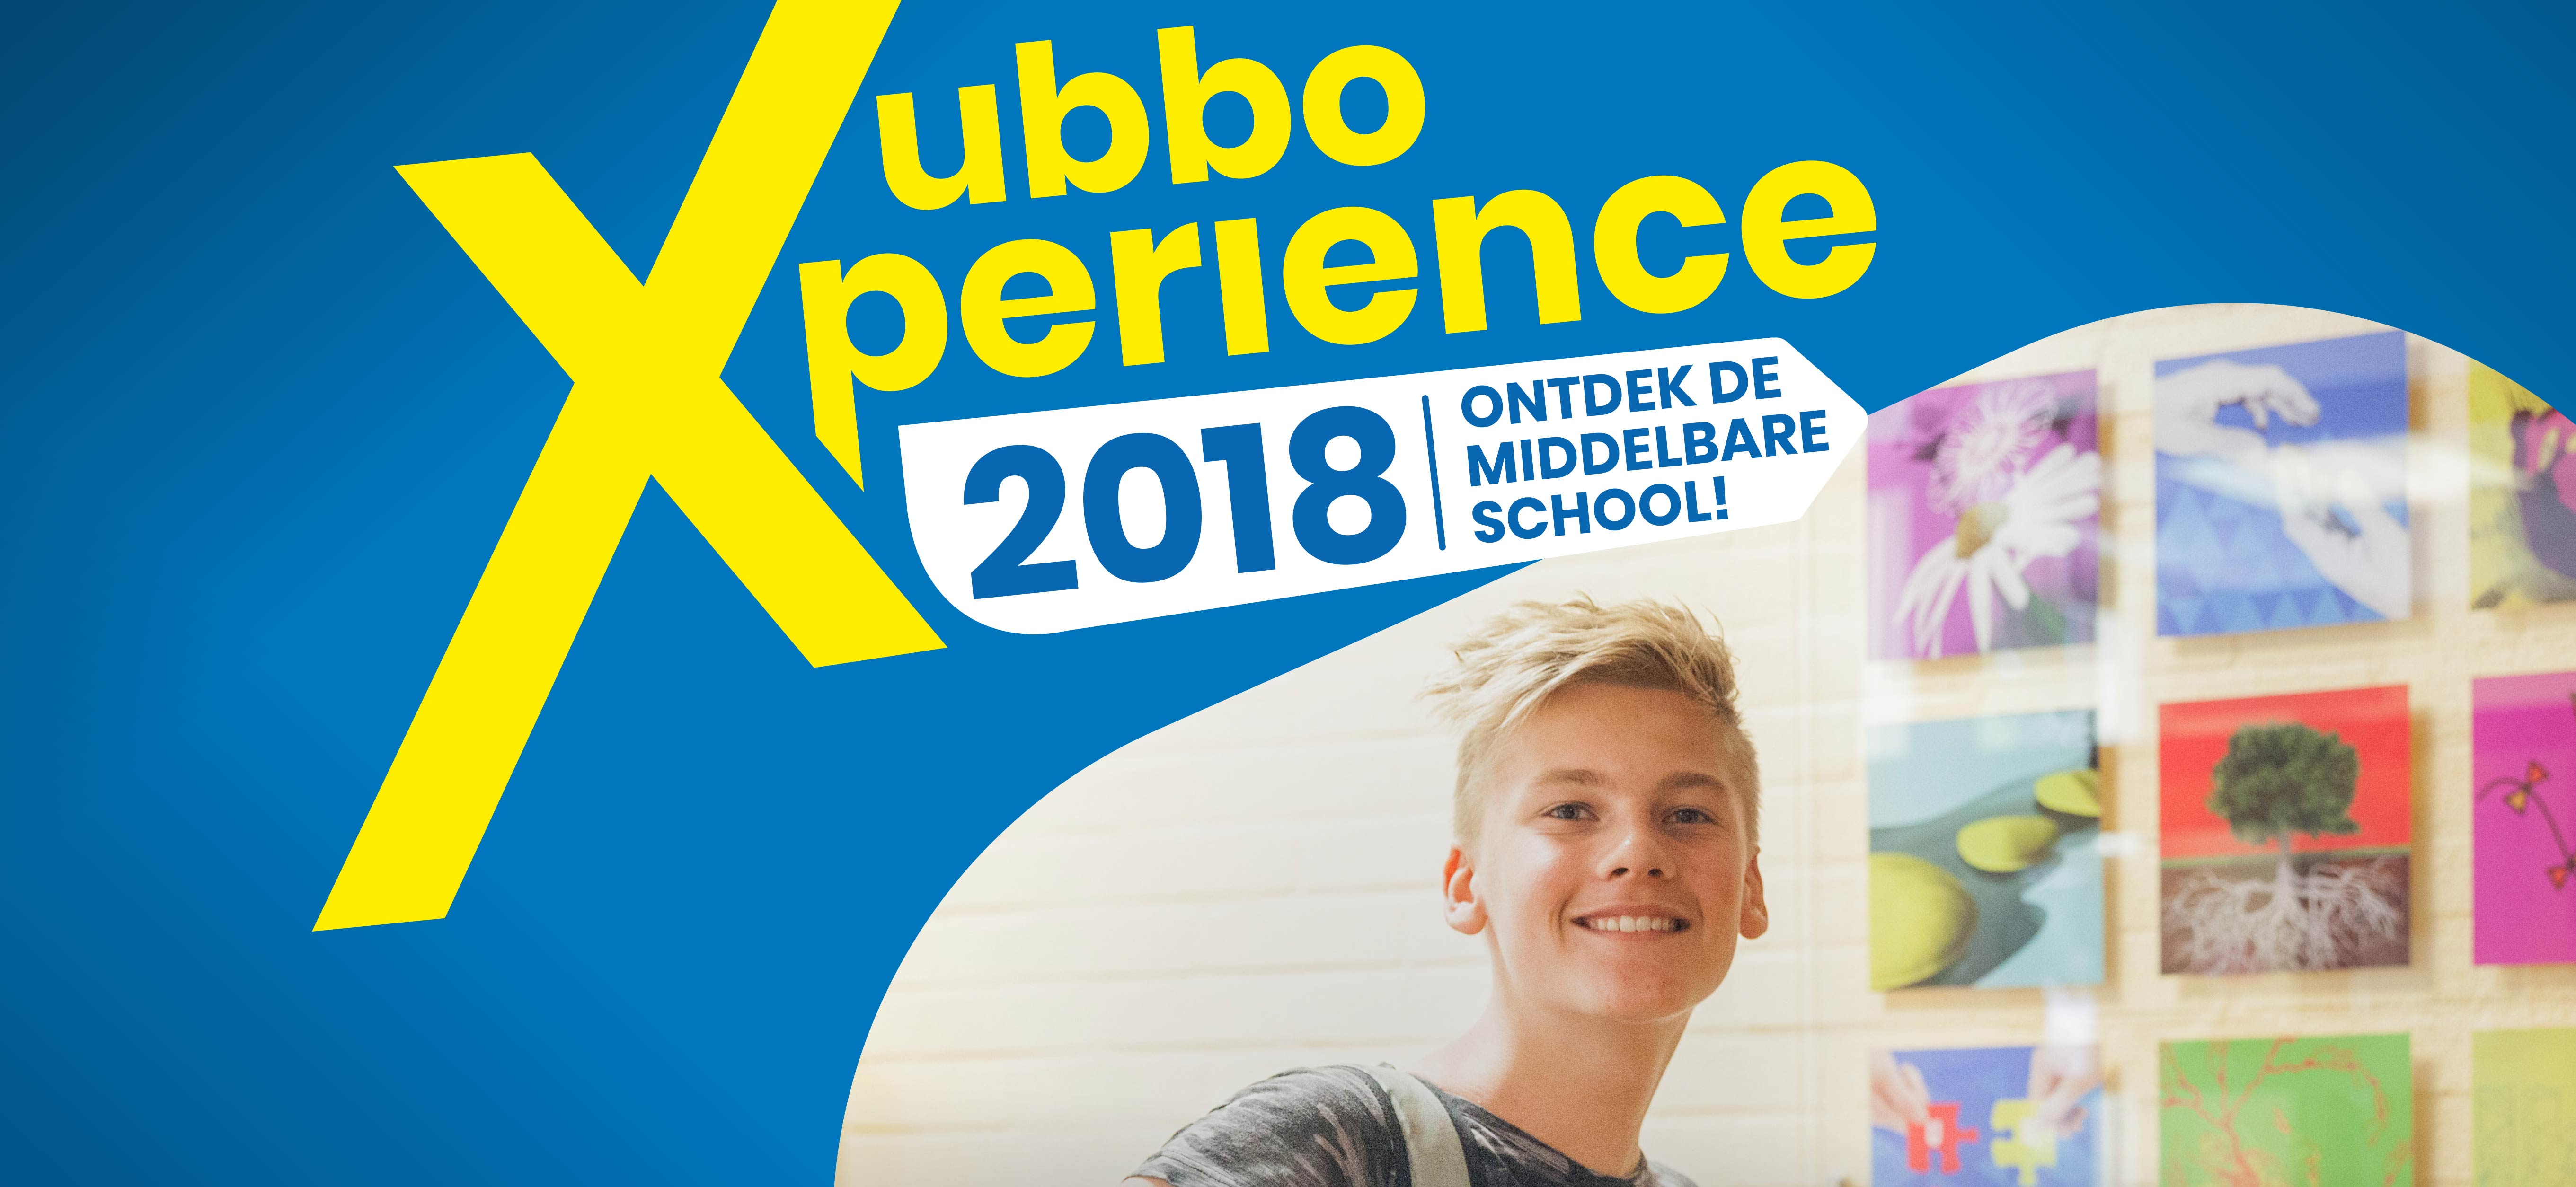 https://www.ubboemmius.nl/wp-content/uploads/2018/10/20181002_ubboemmius_ubboxperience_online_campagne_NIEUWS_1920x885px.jpg